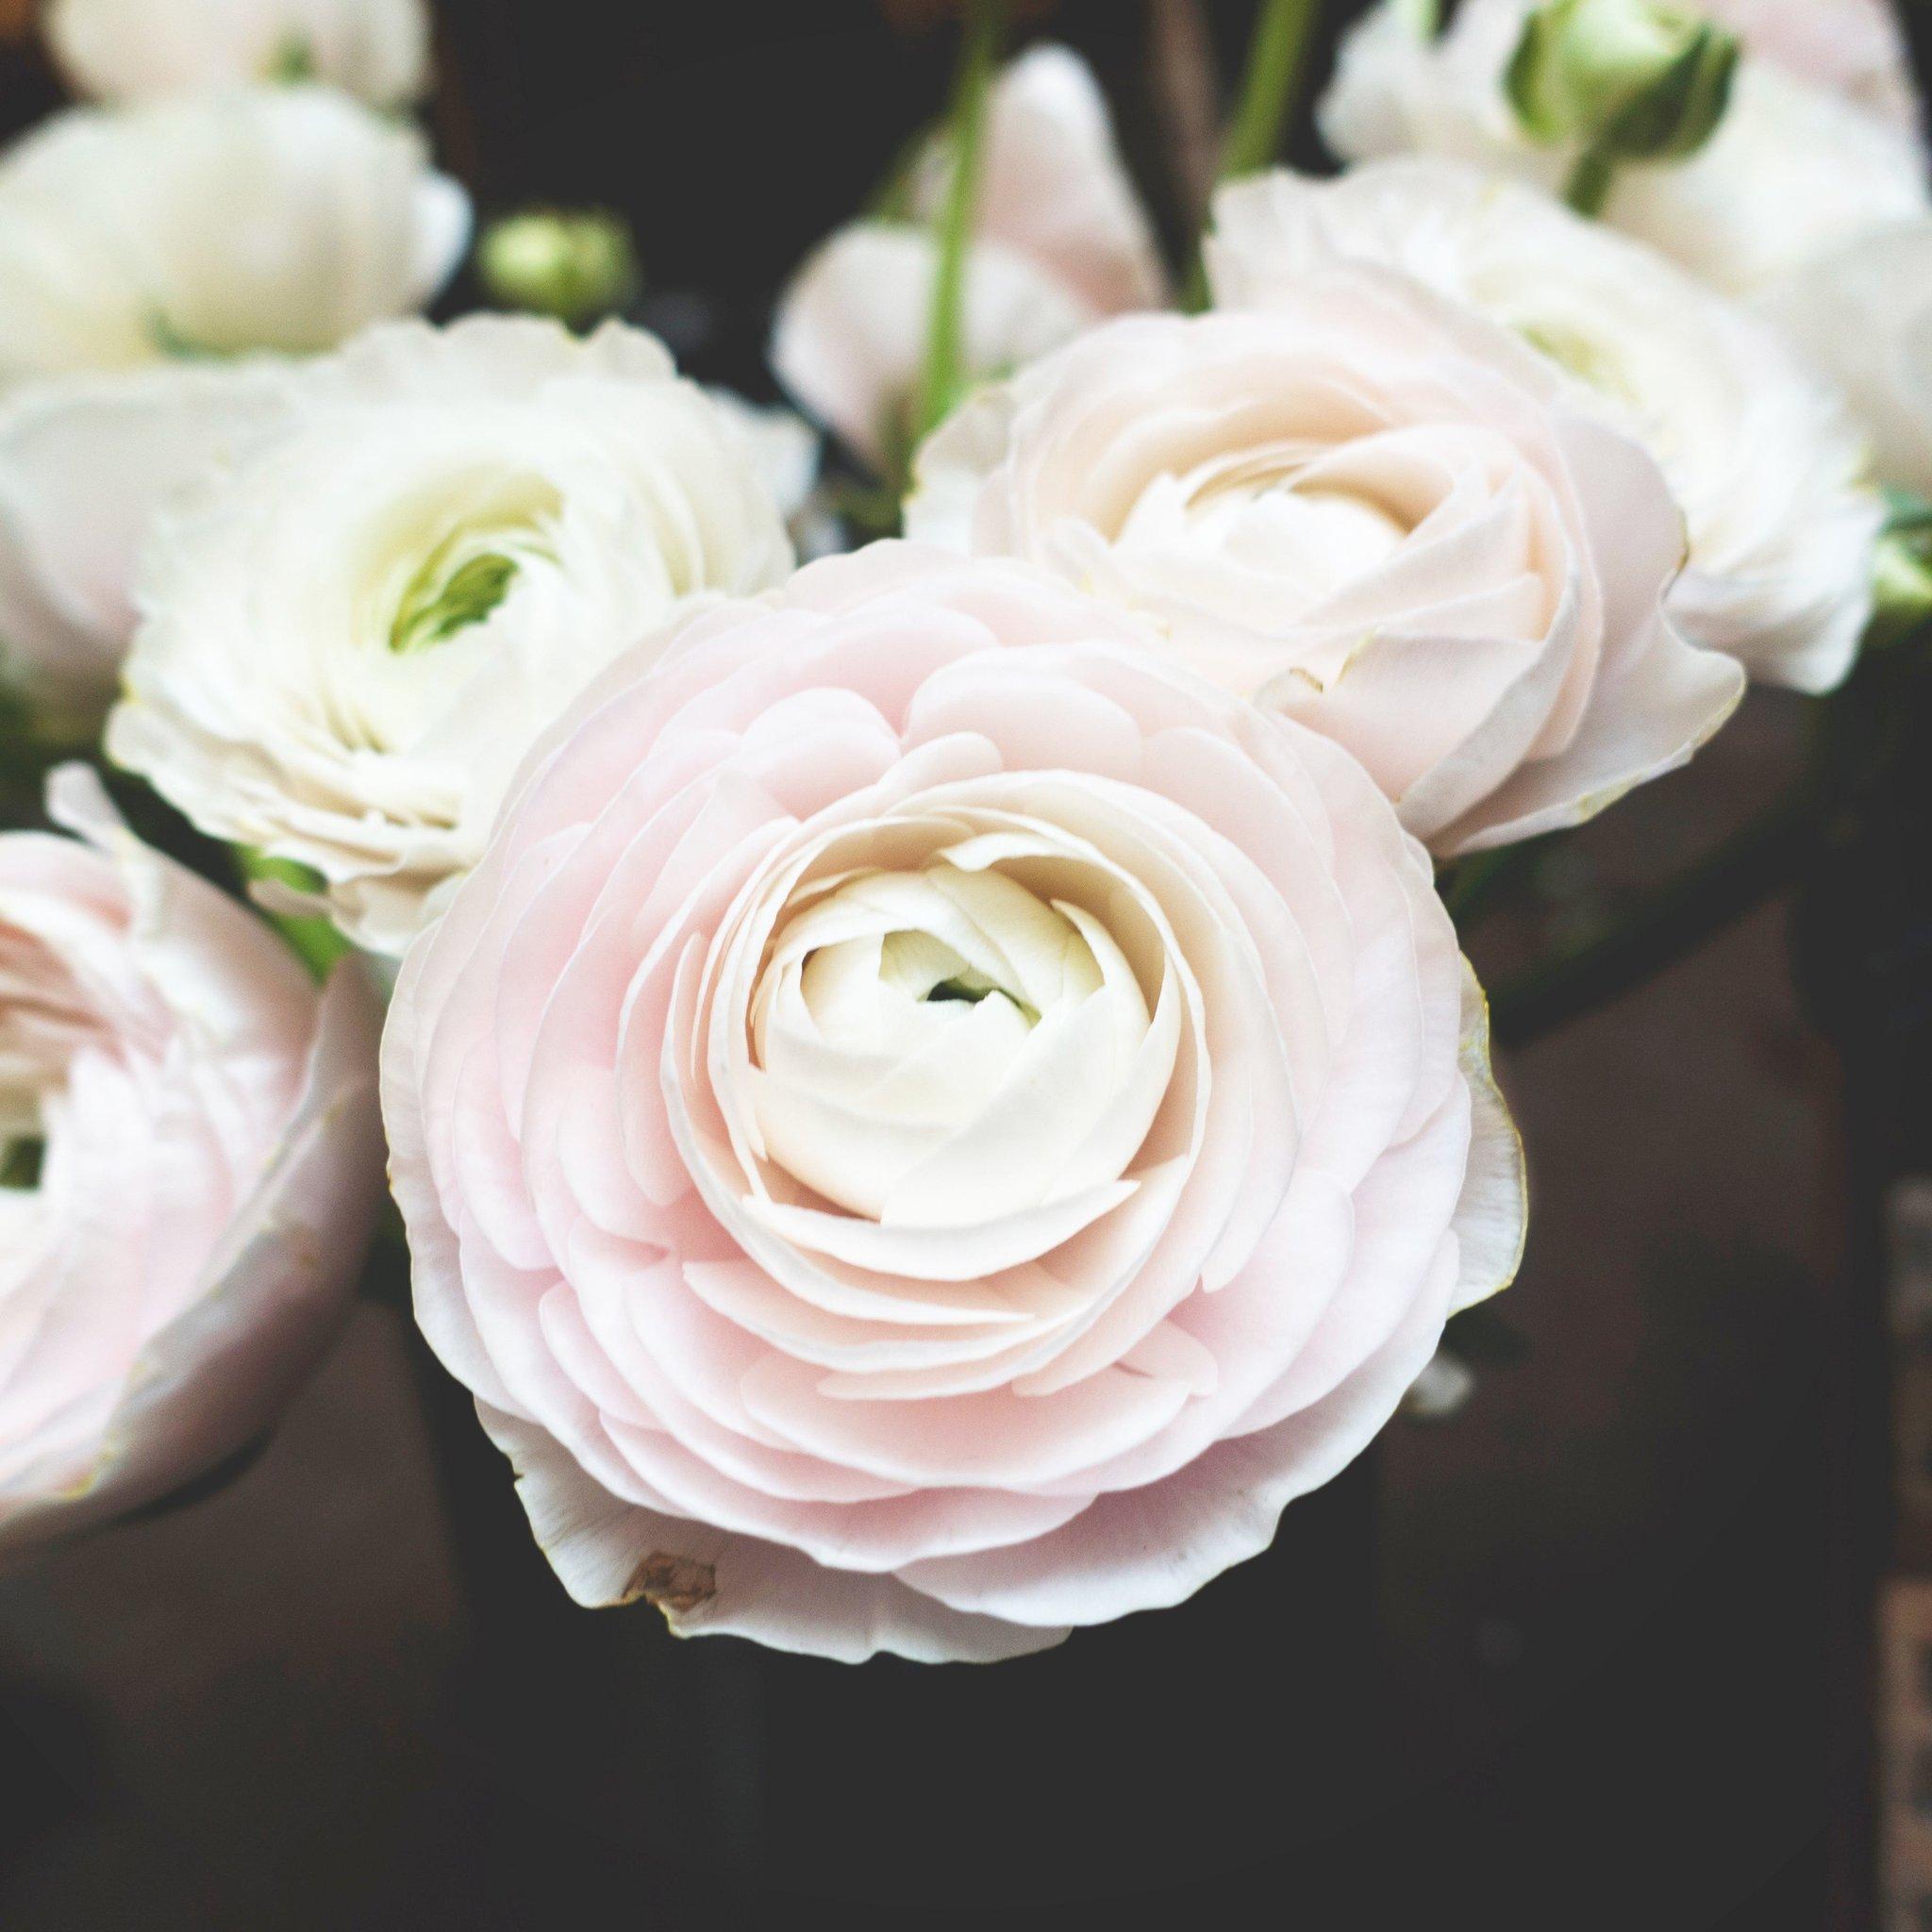 Royal Wedding Flowers 2018 | POPSUGAR Home